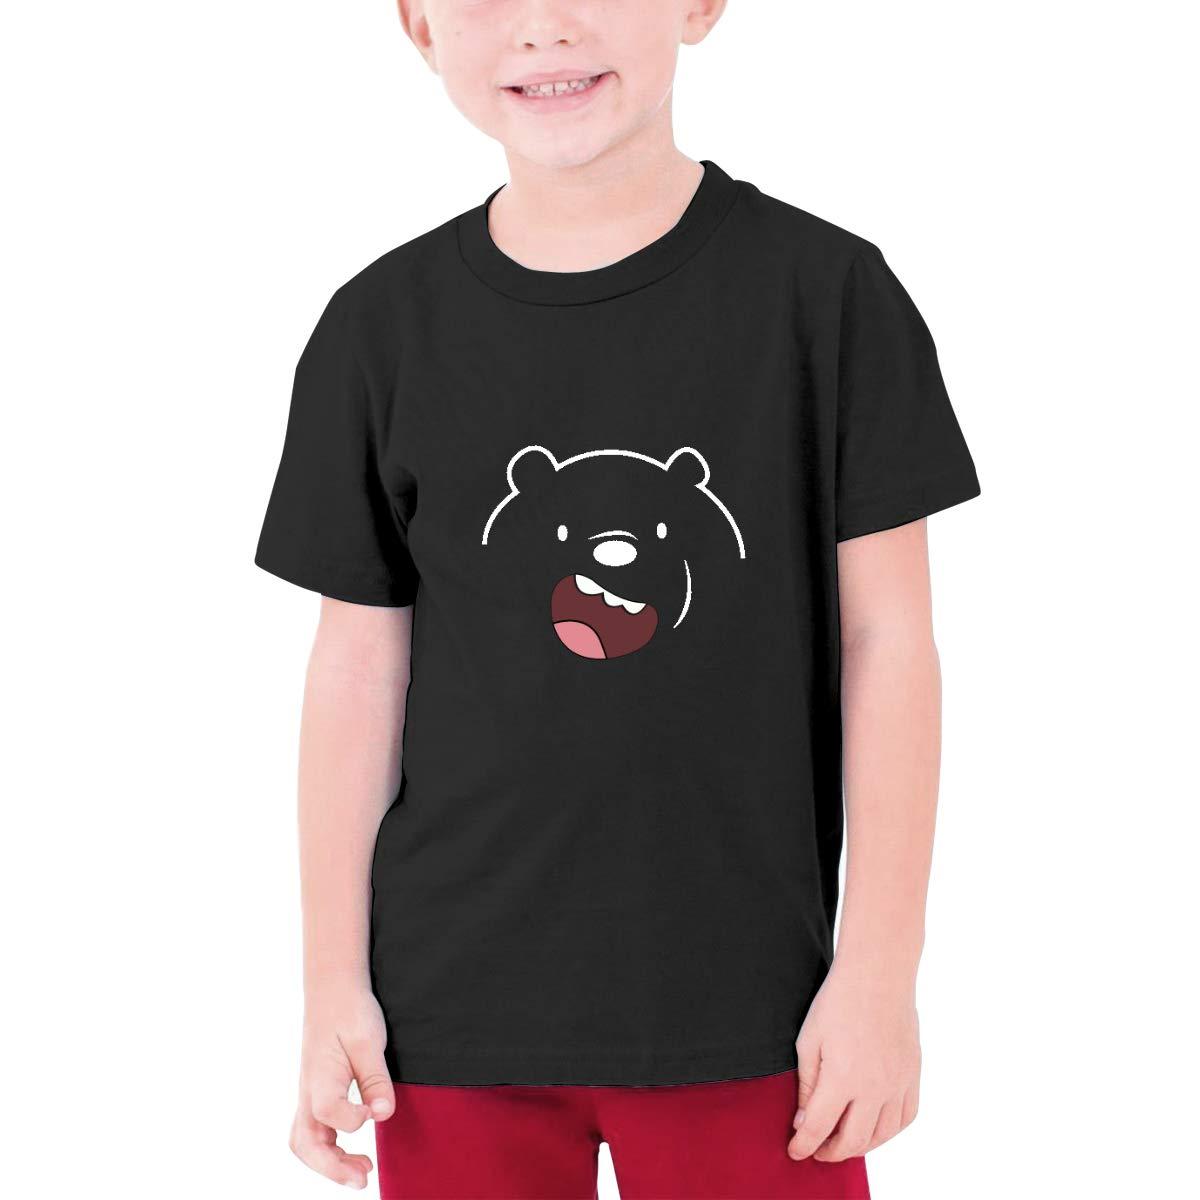 Juwuwenhuachua Designed T Shirt We Bare Bears Funny Shirt Short Sleeve for Minor Black